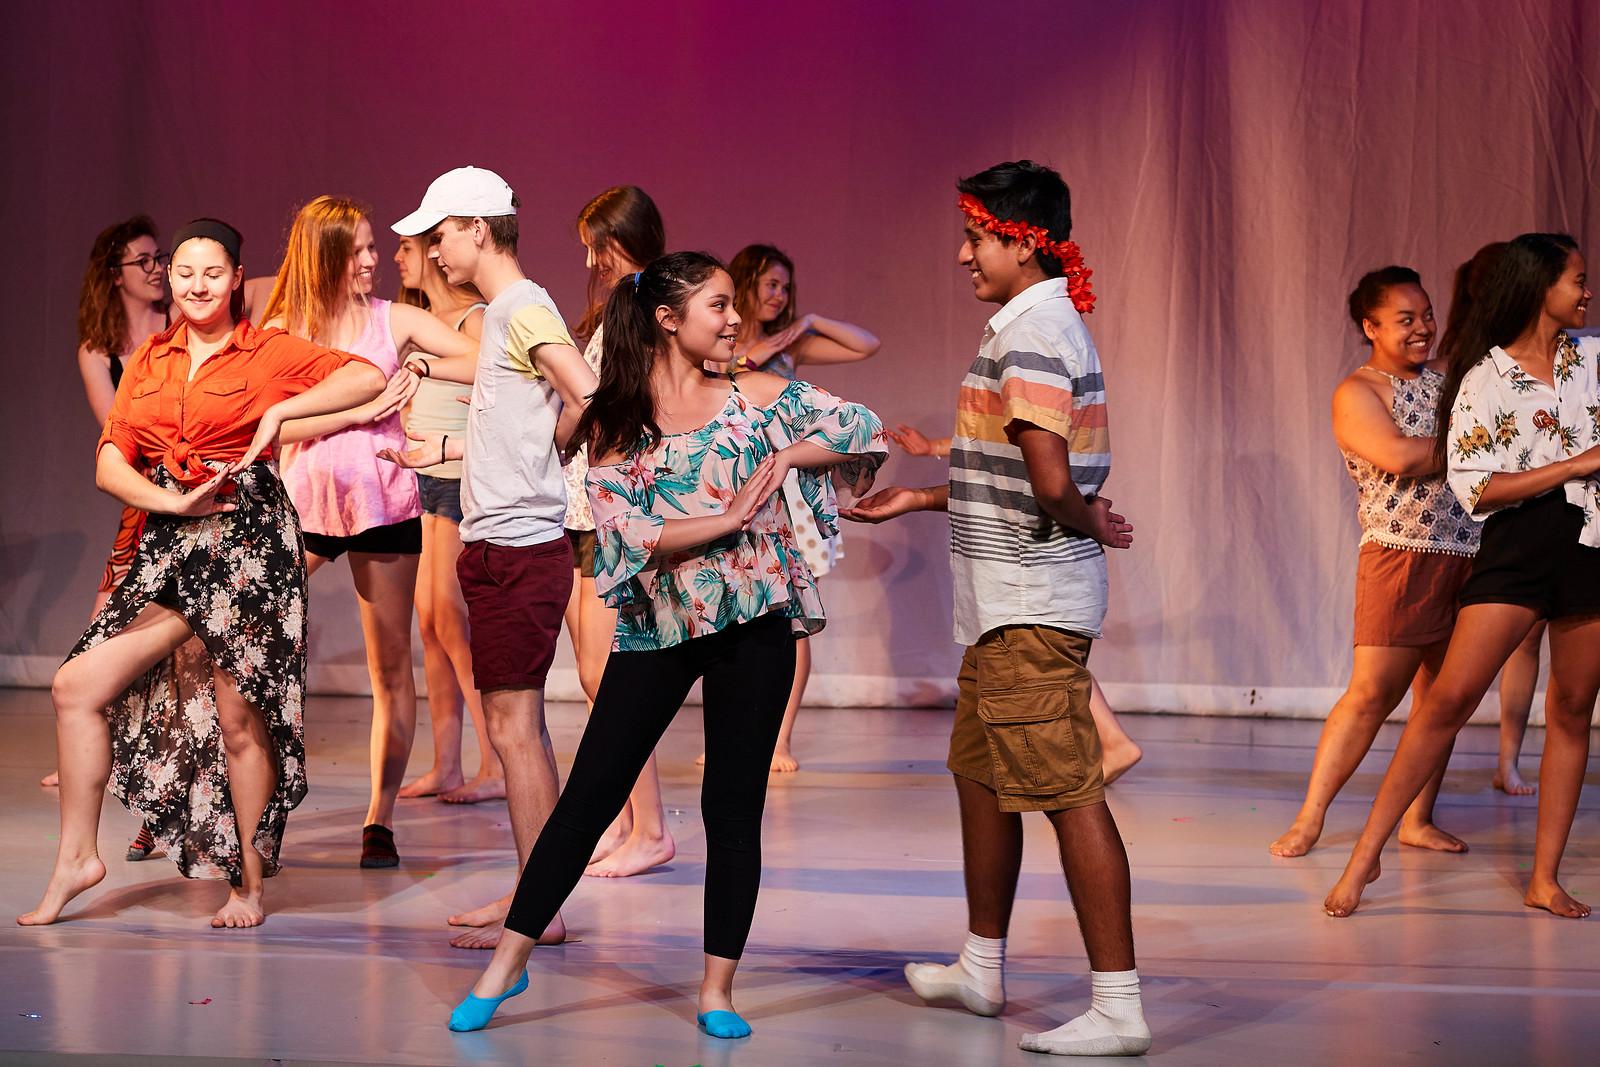 Mayfair dance - May 17, 2017- 42684-X3.jpg